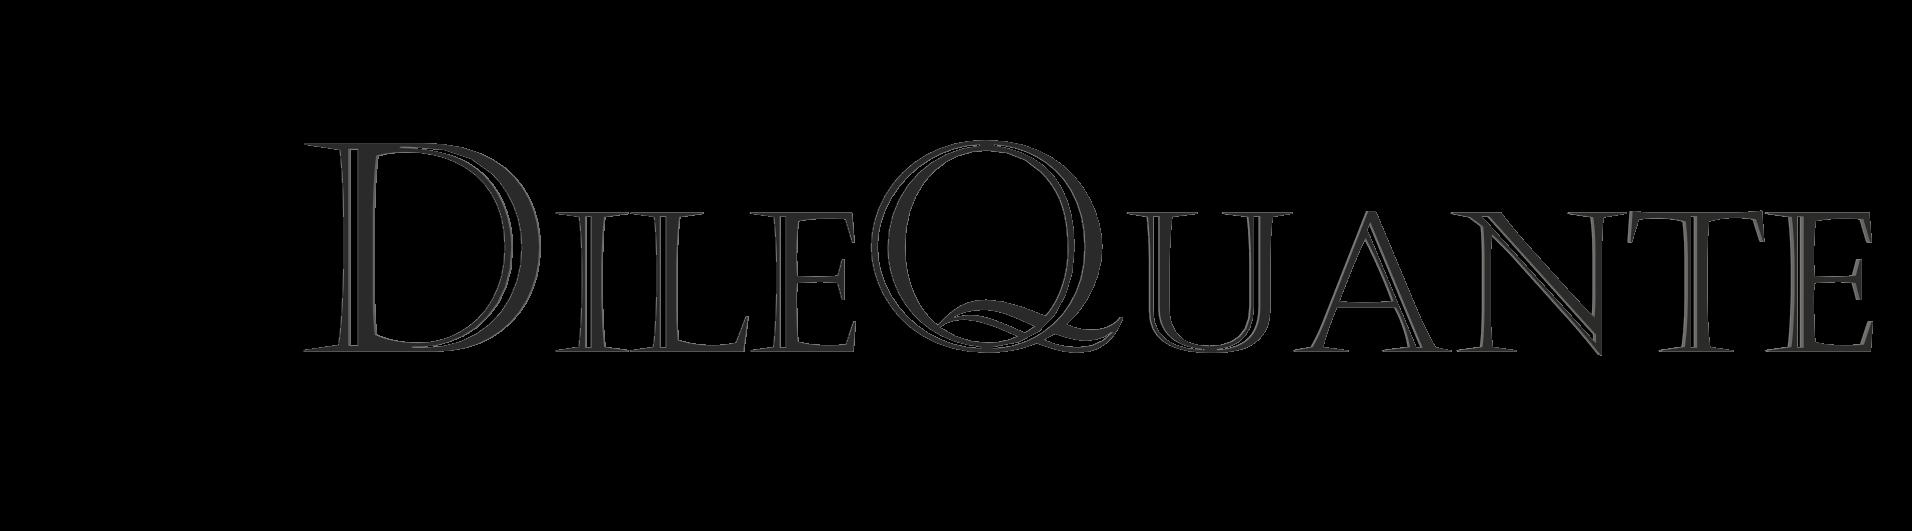 DileQuante